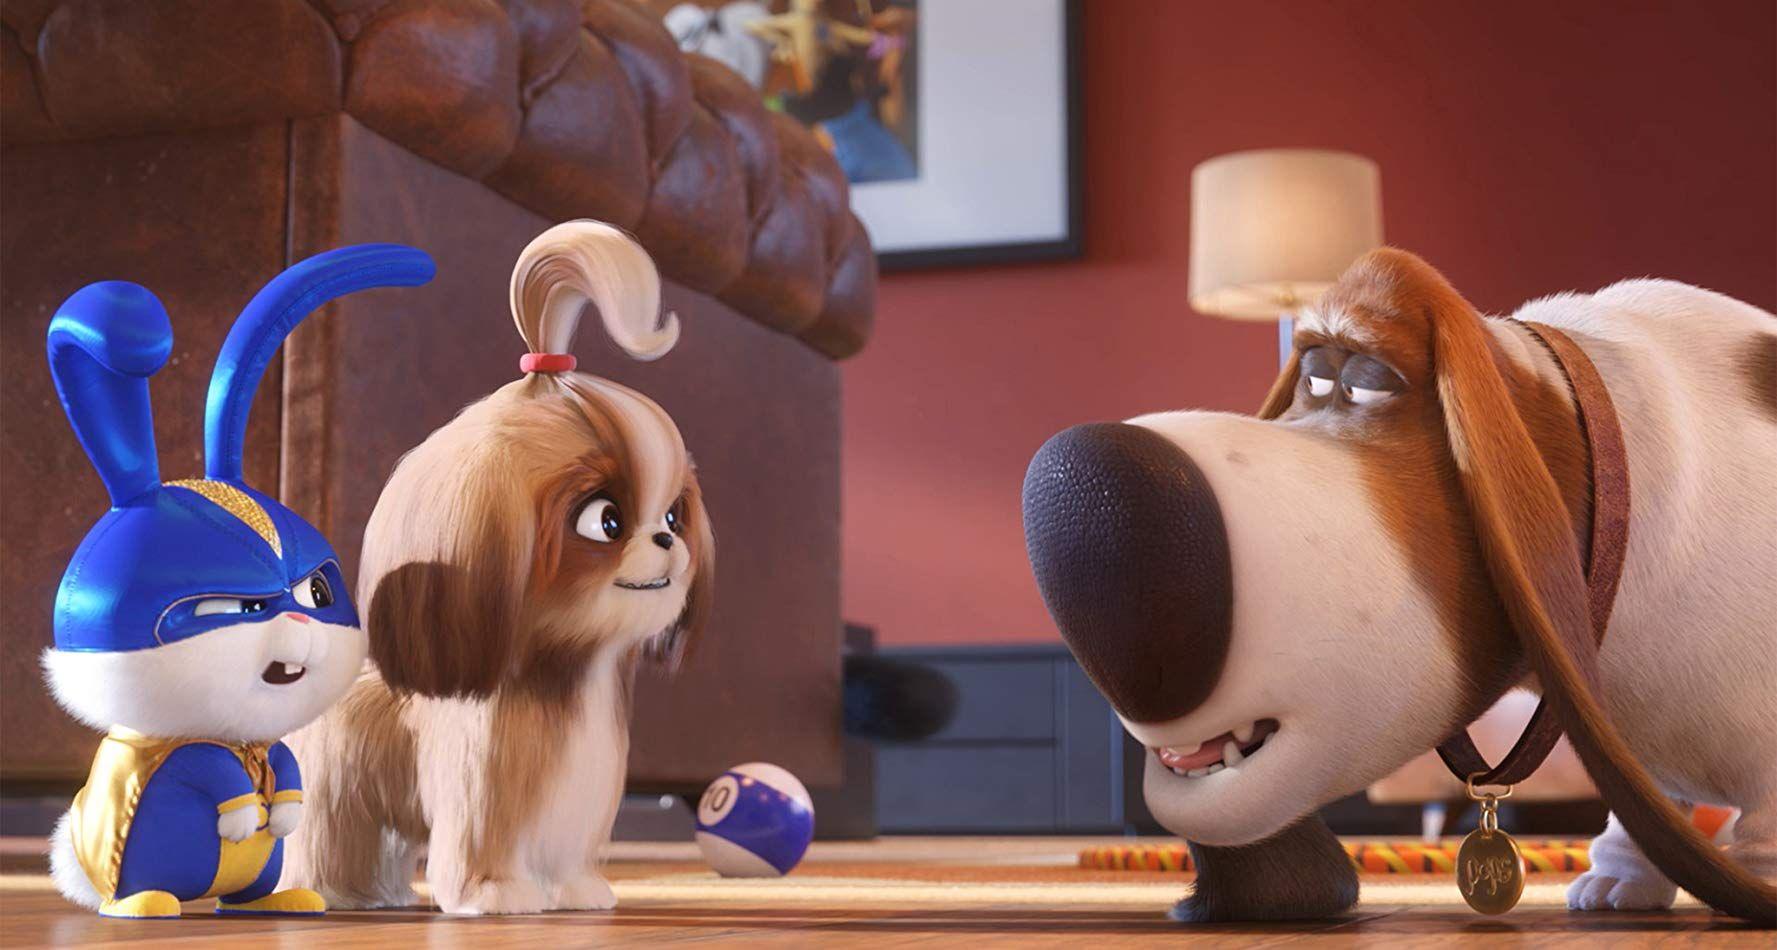 The Secret Life Of Pets 2 Watch Exclusive Movies Online Secret Life Of Pets Universal Pictures Secret Life